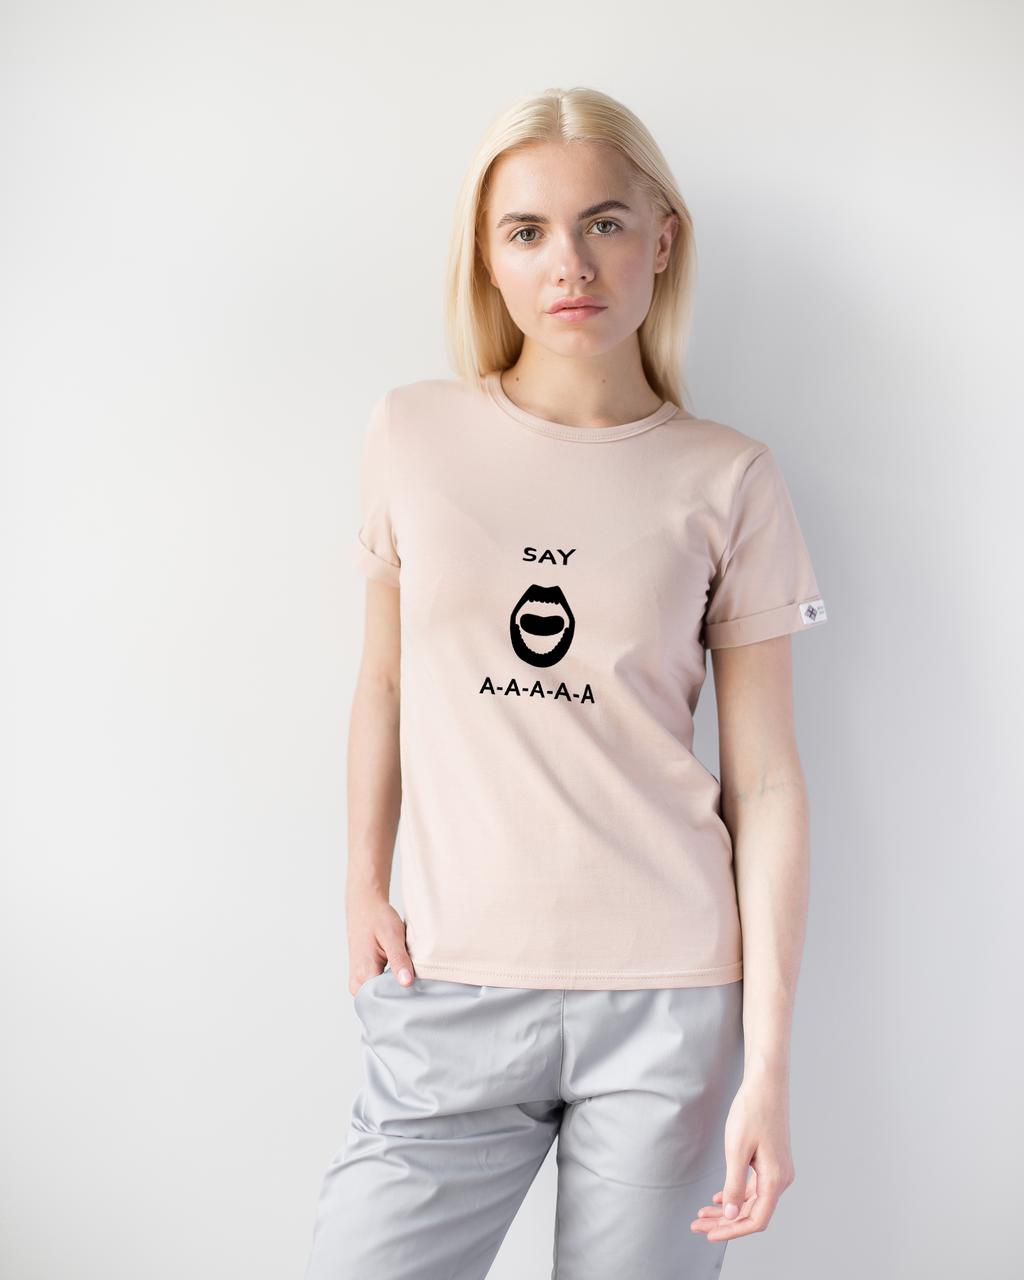 Женская футболка Модерн, беж принт Say AAA